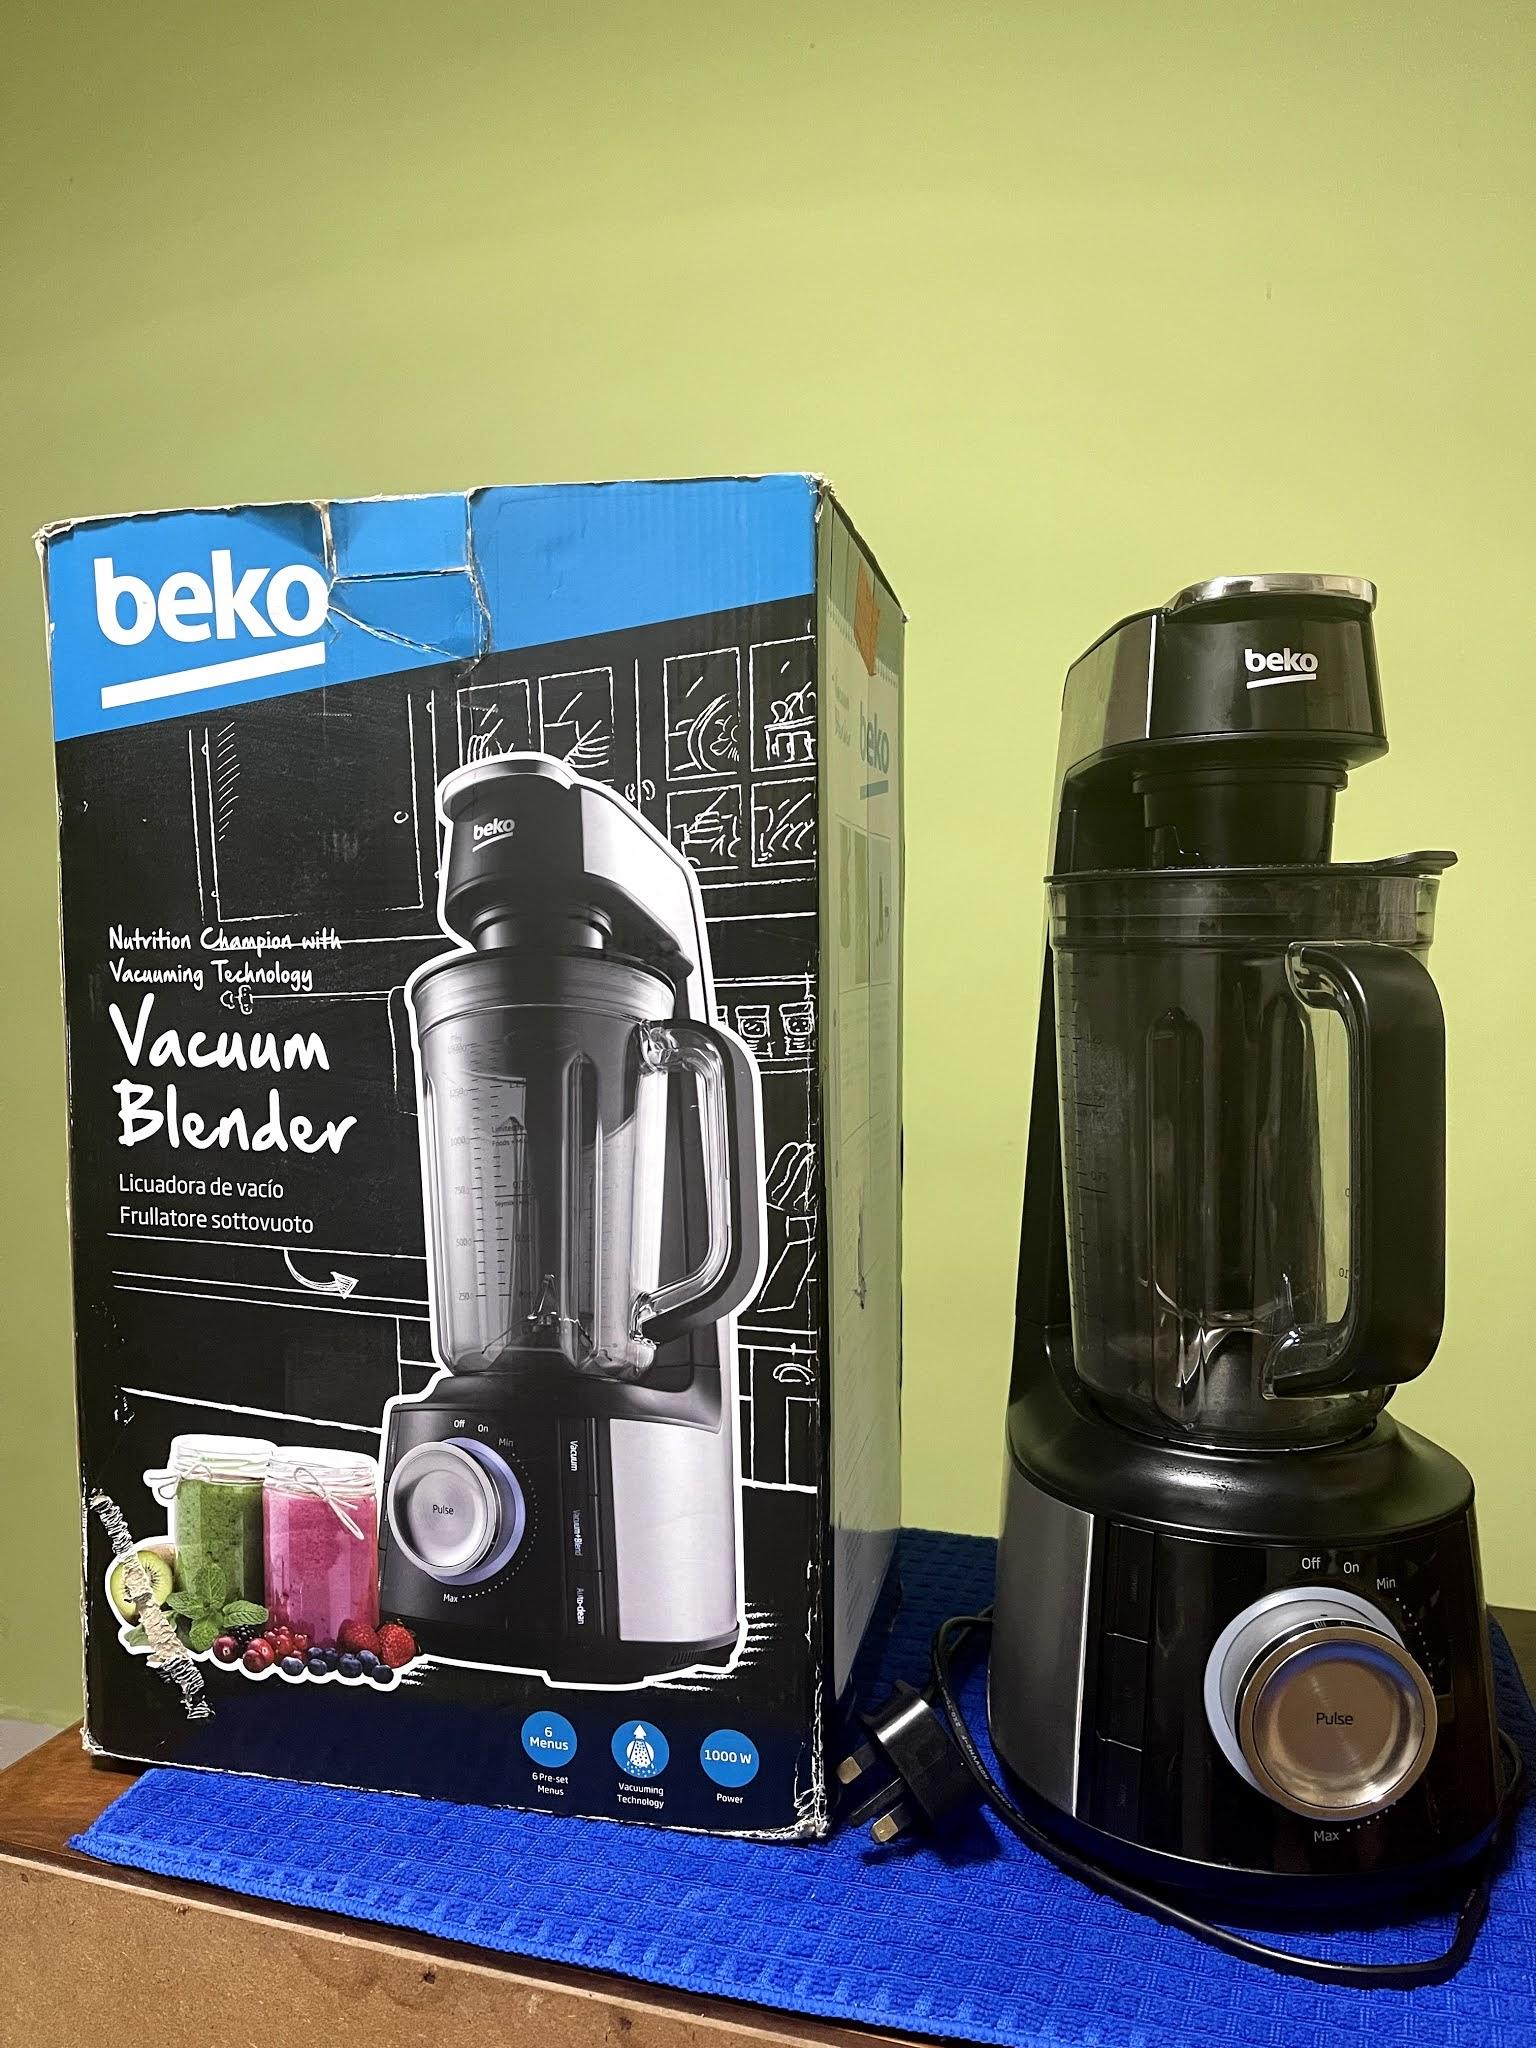 REVIEW BEKO VACUUM BLENDER TBV8104BX